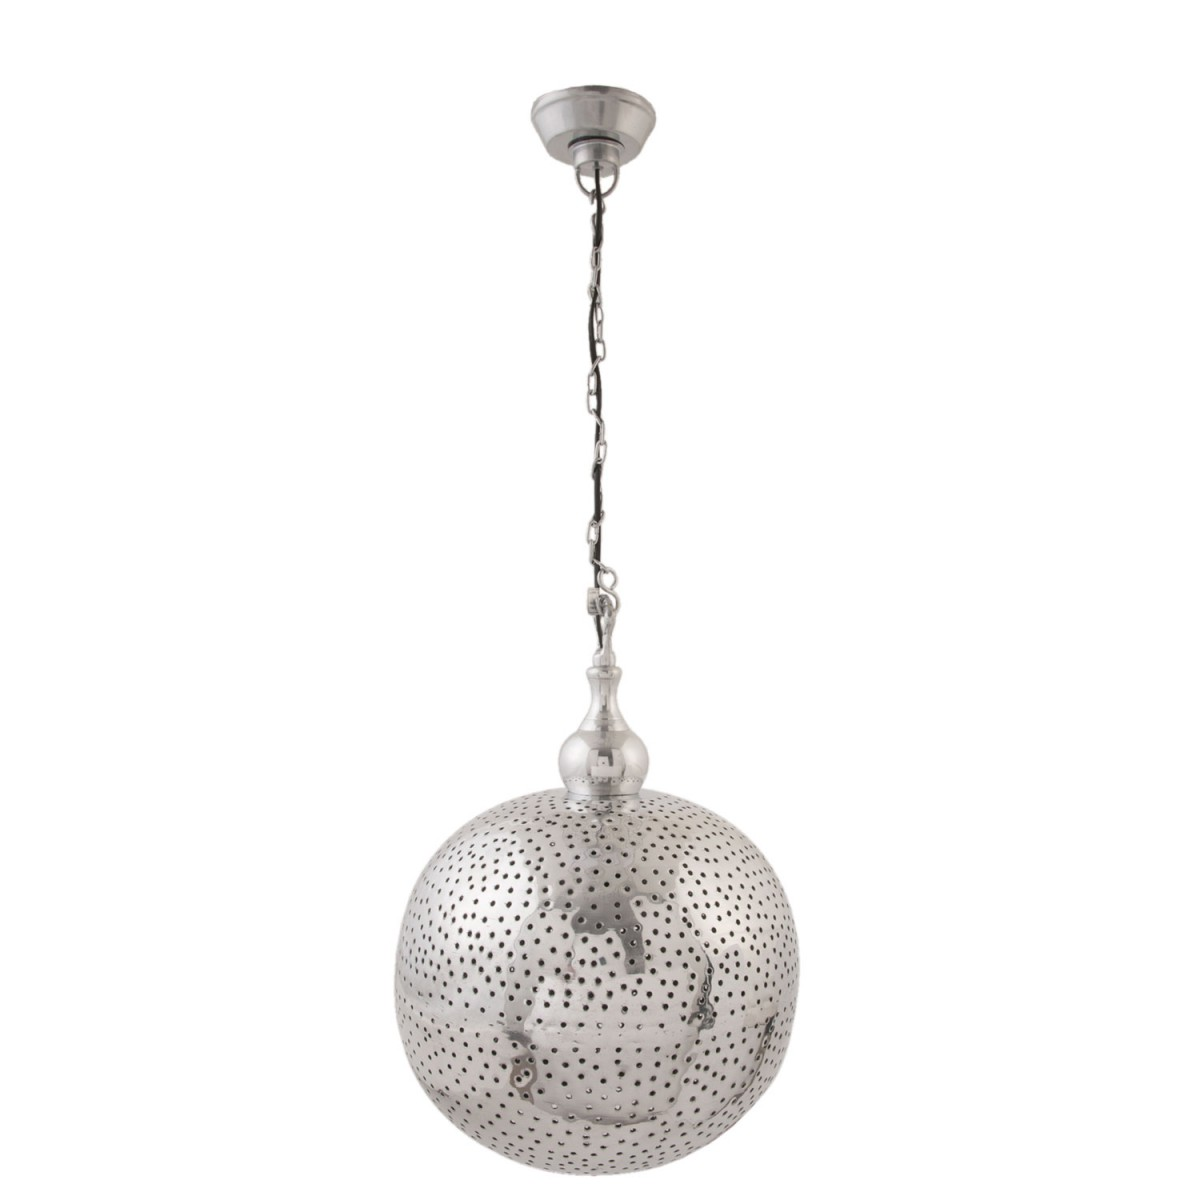 clayre eef h ngelampe lampe silber nickel l nge 145cm. Black Bedroom Furniture Sets. Home Design Ideas